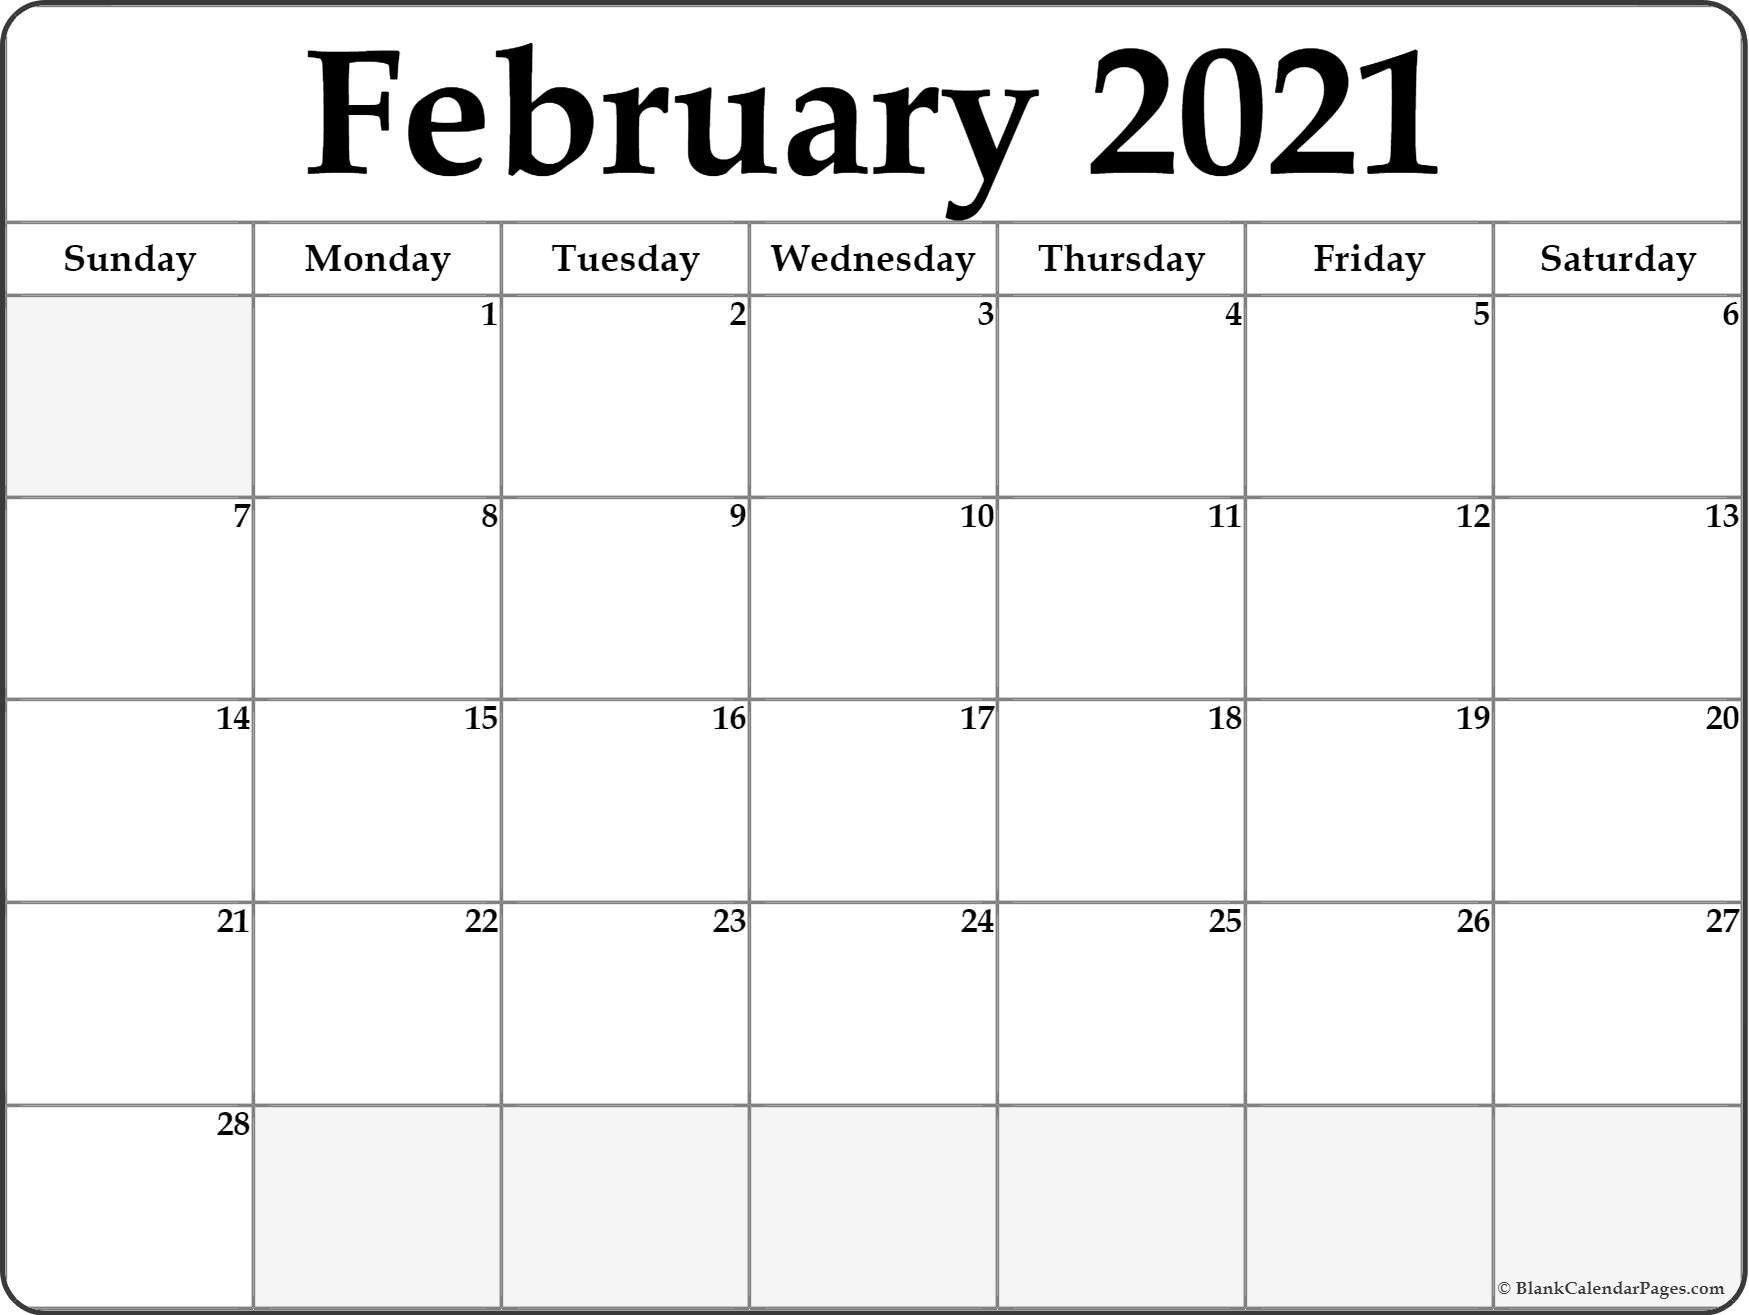 Calendar February 2021 Editable Planner In 2020 | Calendar